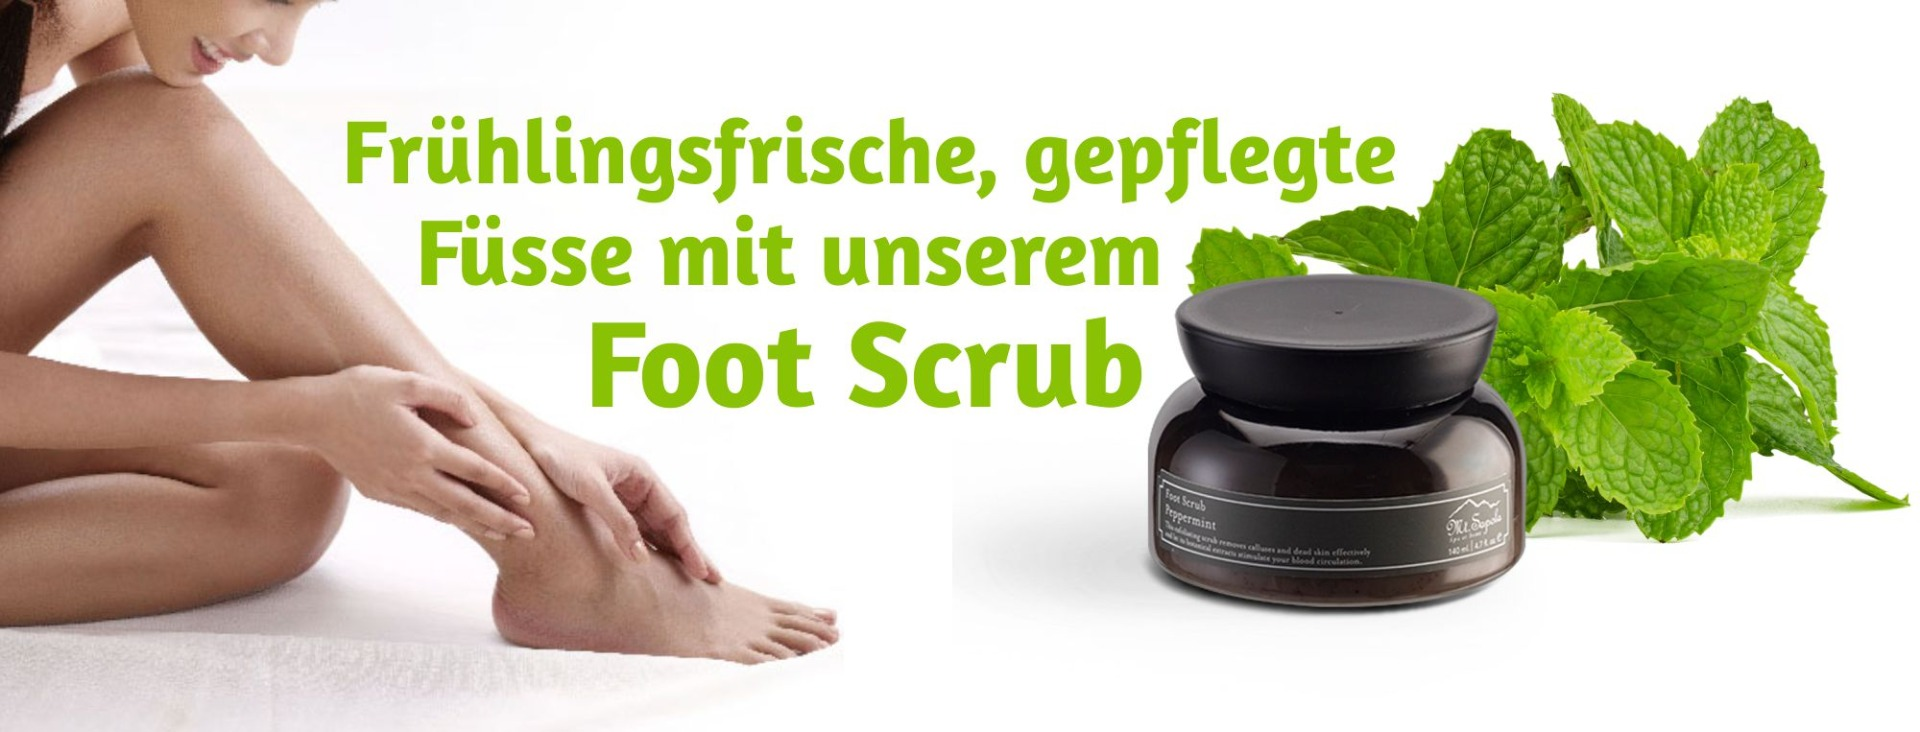 mtsapola-shop.de/foot-spa